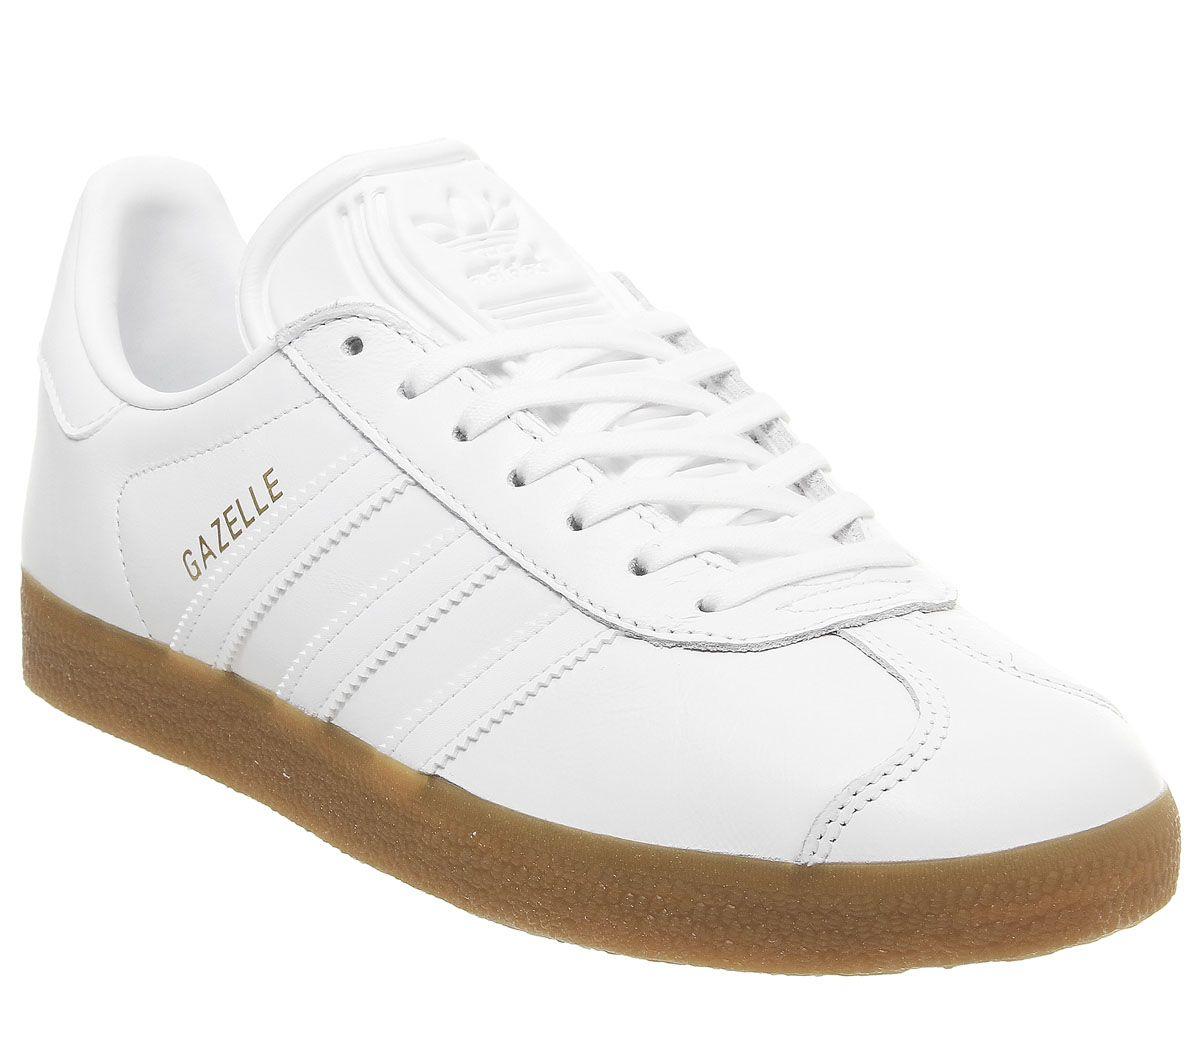 2zapatillas adidas gazelle blancas hombre